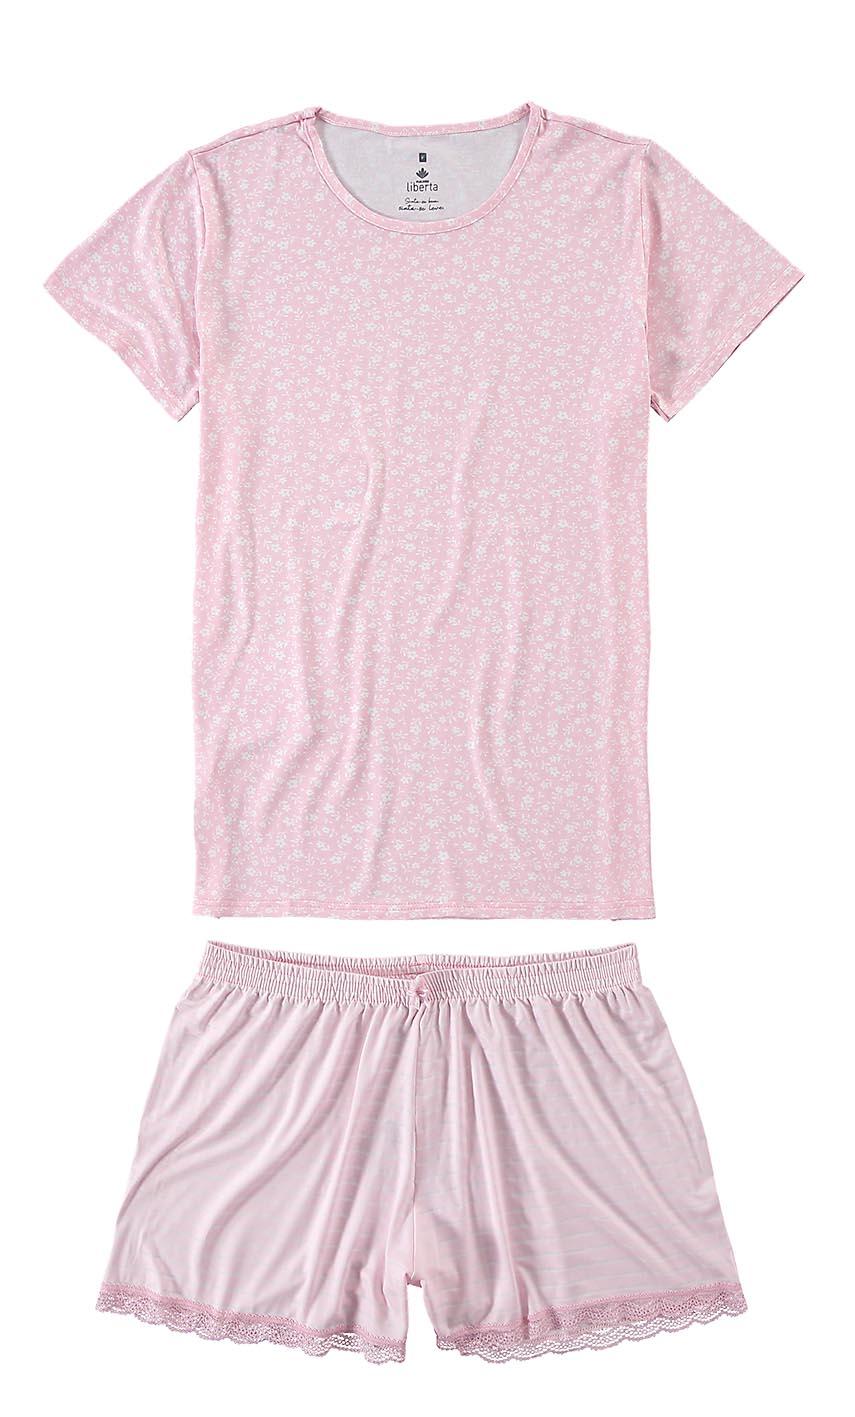 Pijama Feminino ADULTO Rosa Listras - Malwee